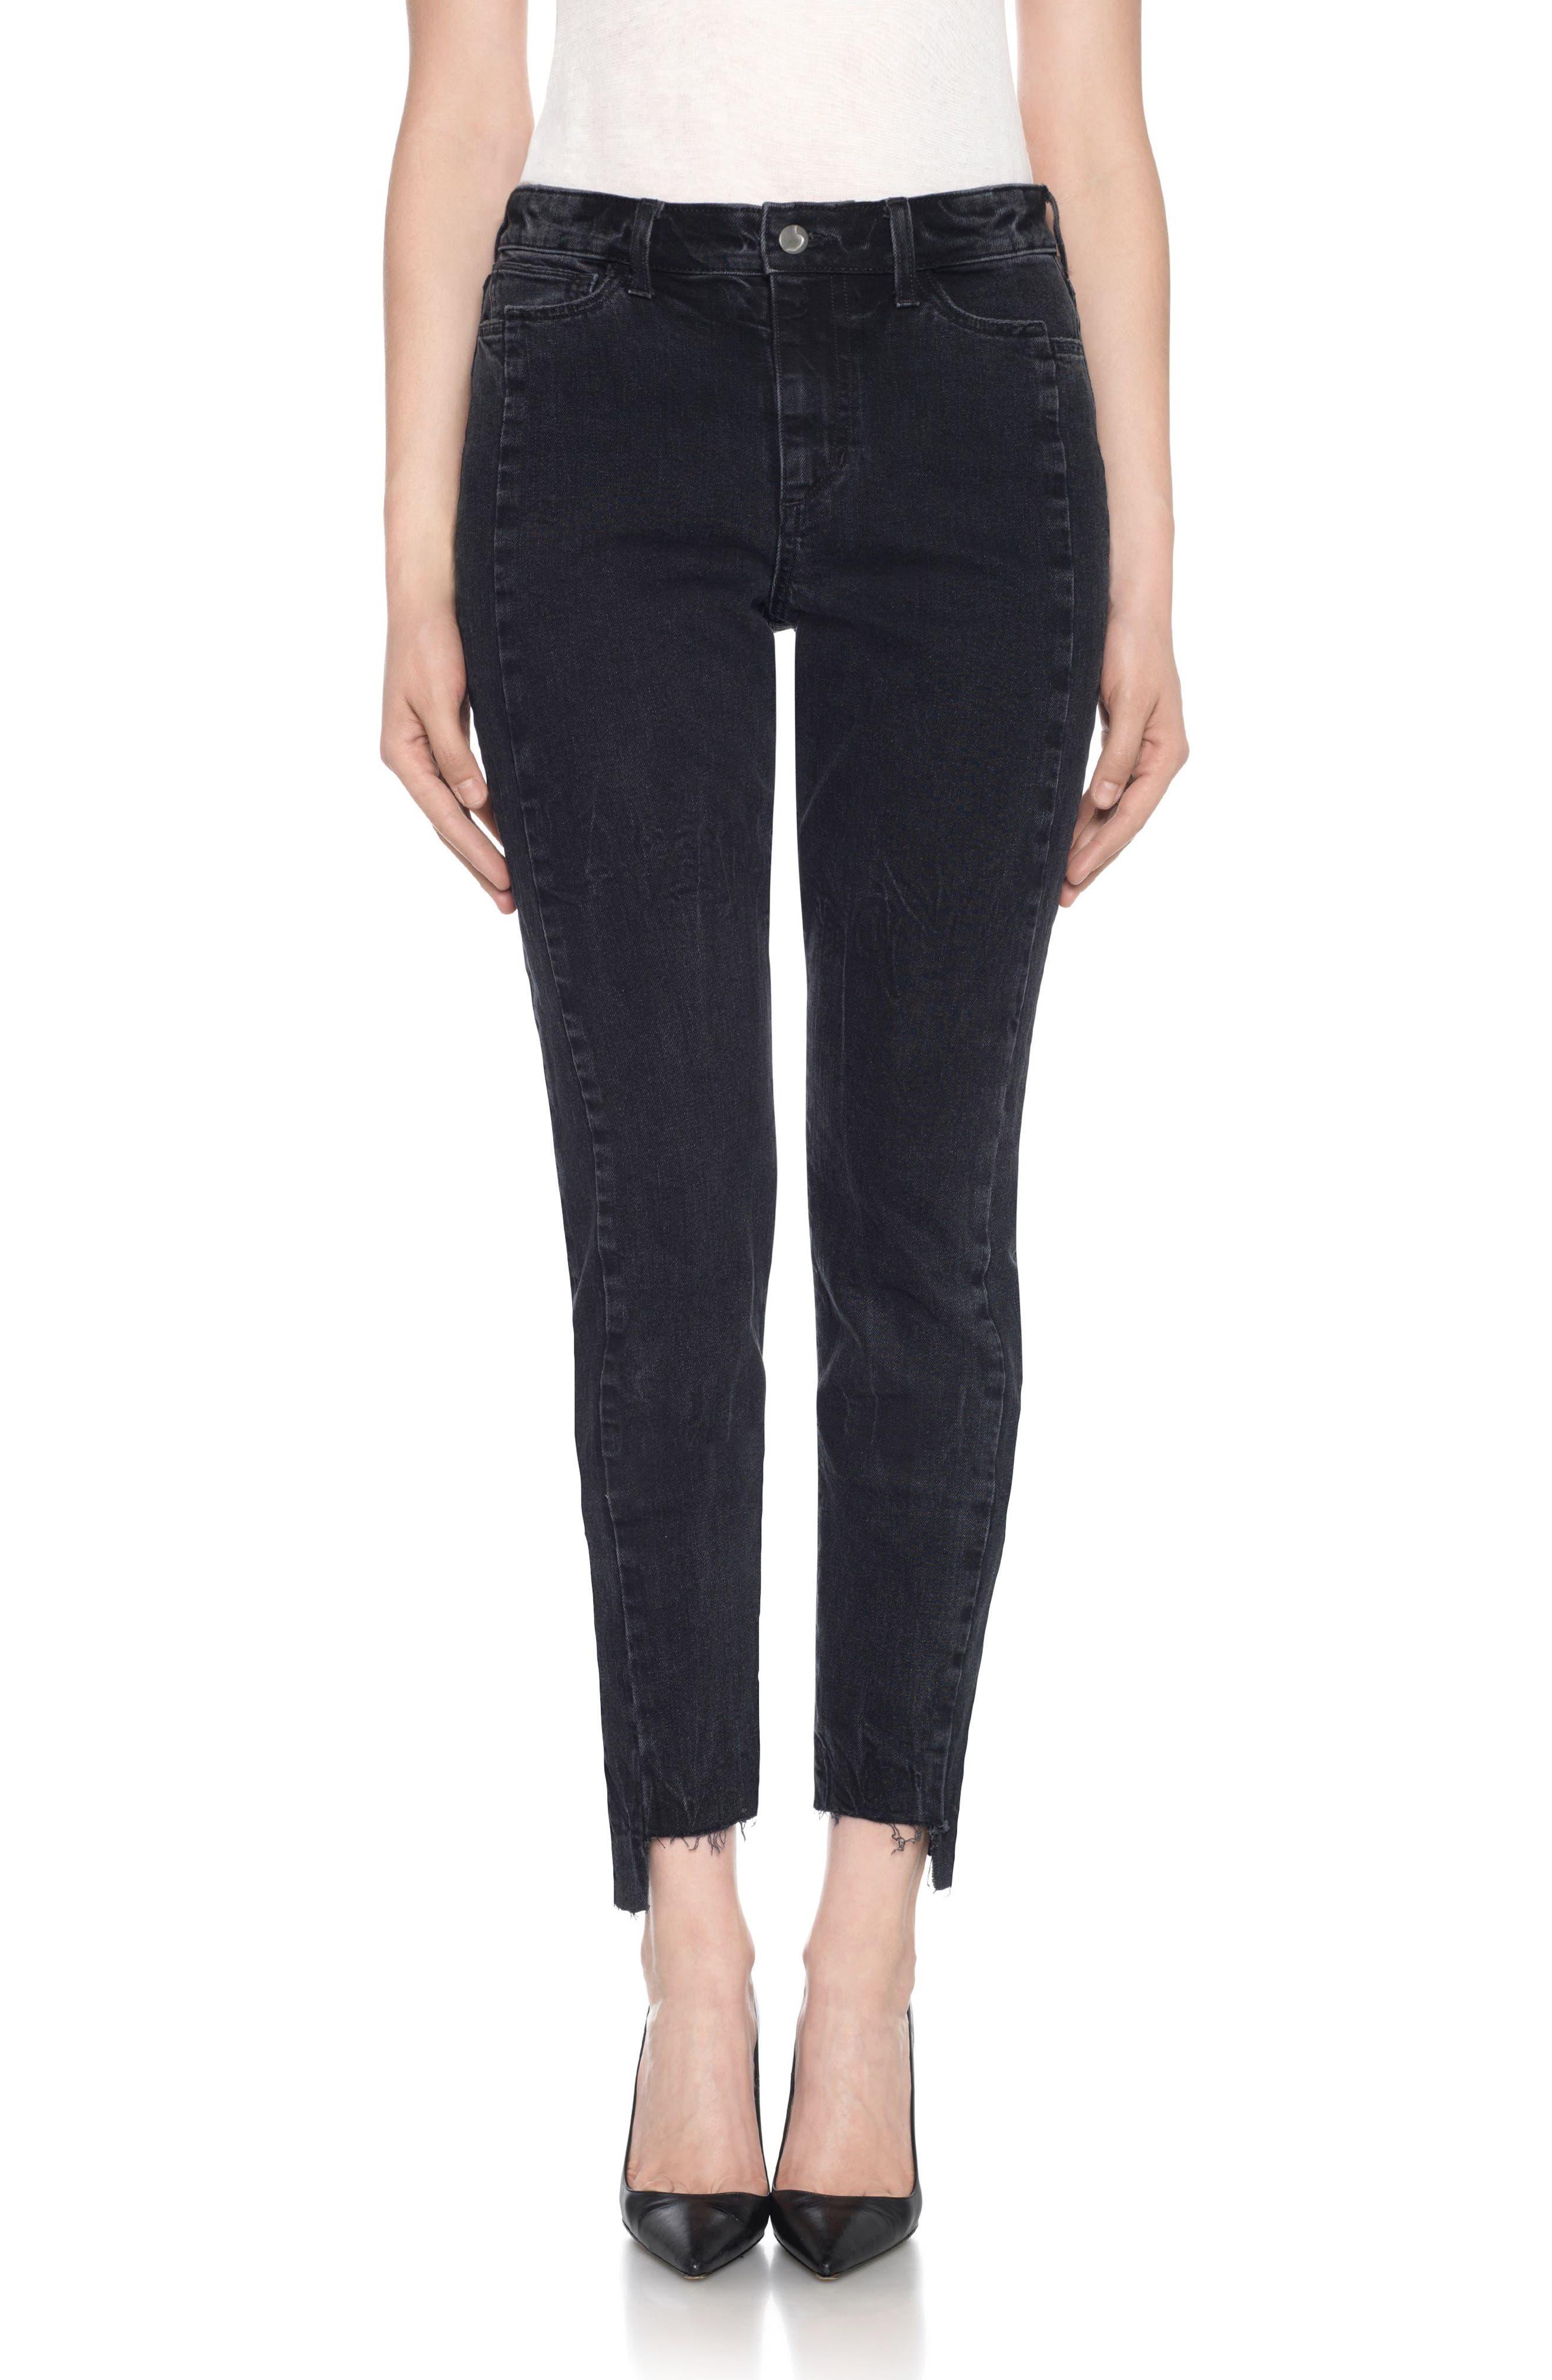 Alternate Image 1 Selected - Taylor Hill x Joe's Kass Raw Step Hem Ankle Skinny Jeans (Domino)